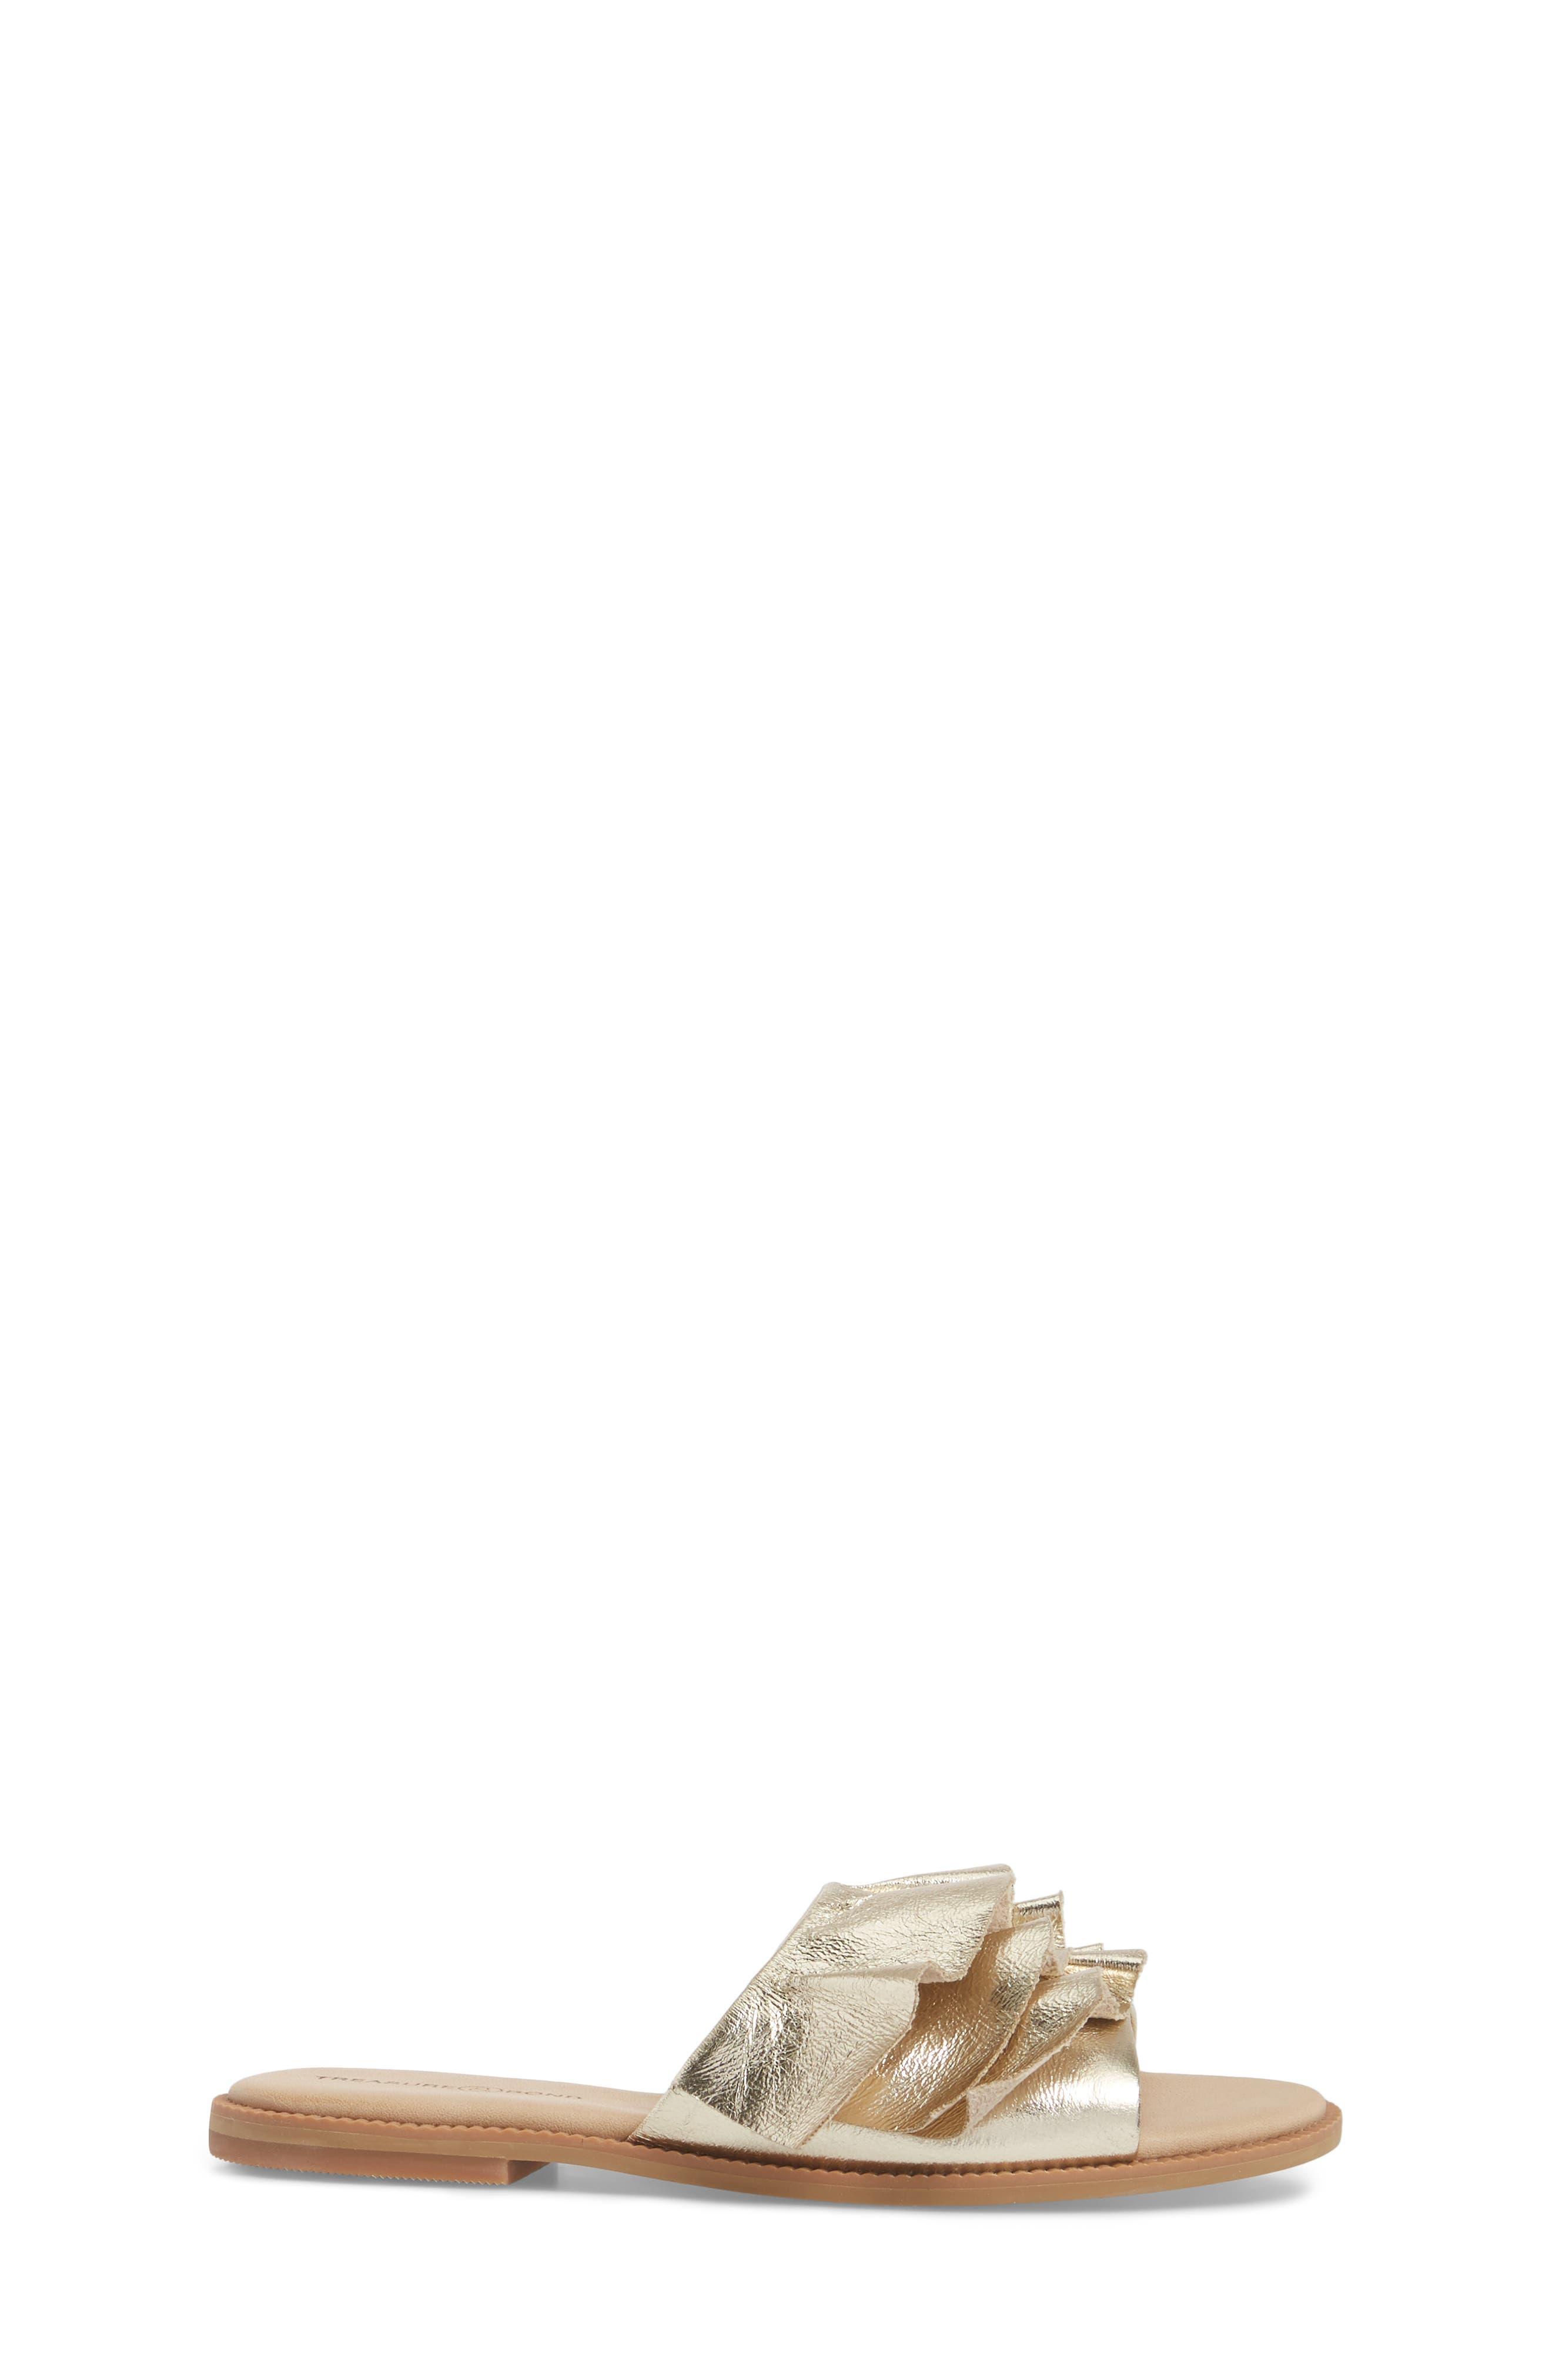 Ruby Ruffled Slide Sandal,                             Alternate thumbnail 3, color,                             Gold Crackle Faux Leather